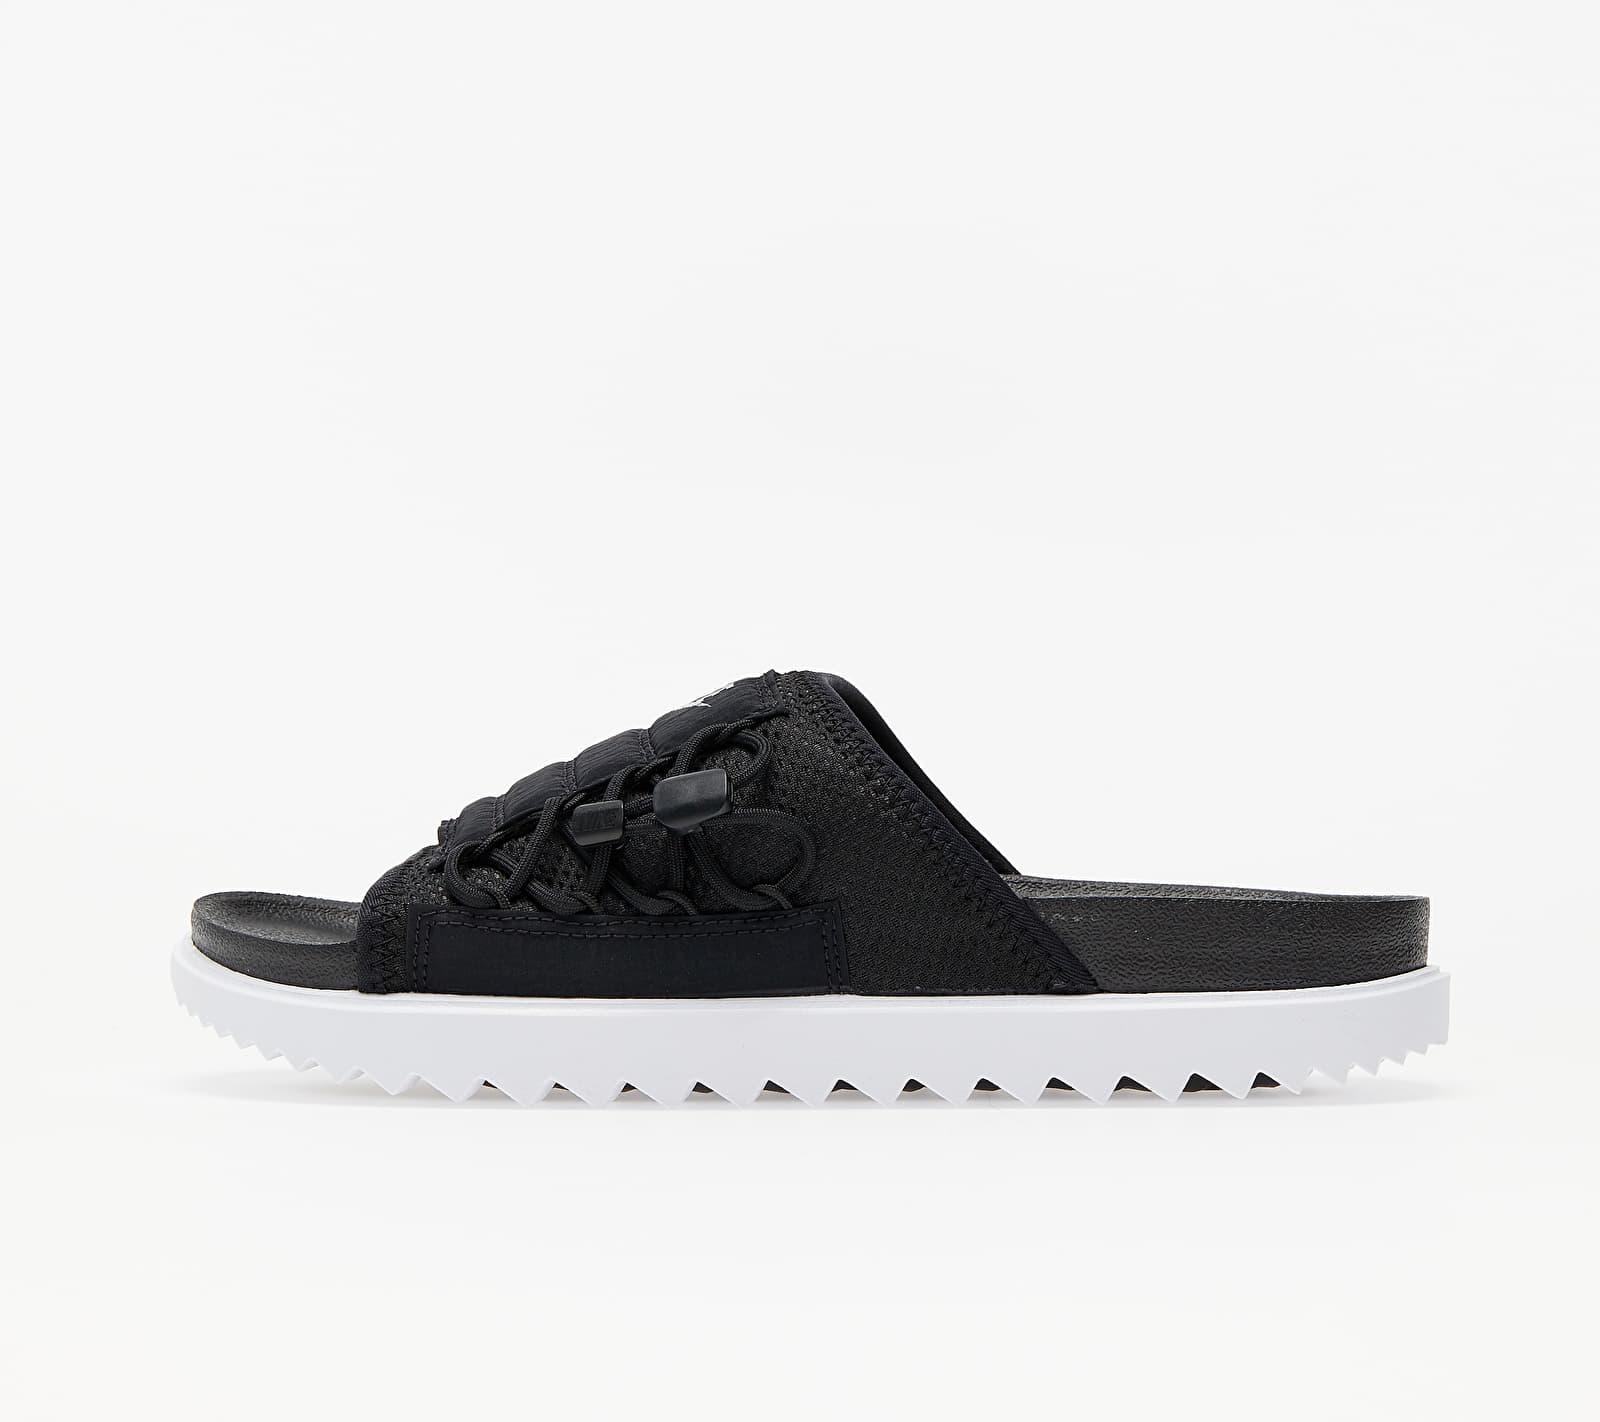 Nike Wmns Asuna Slide Black/ Anthracite-White EUR 36.5